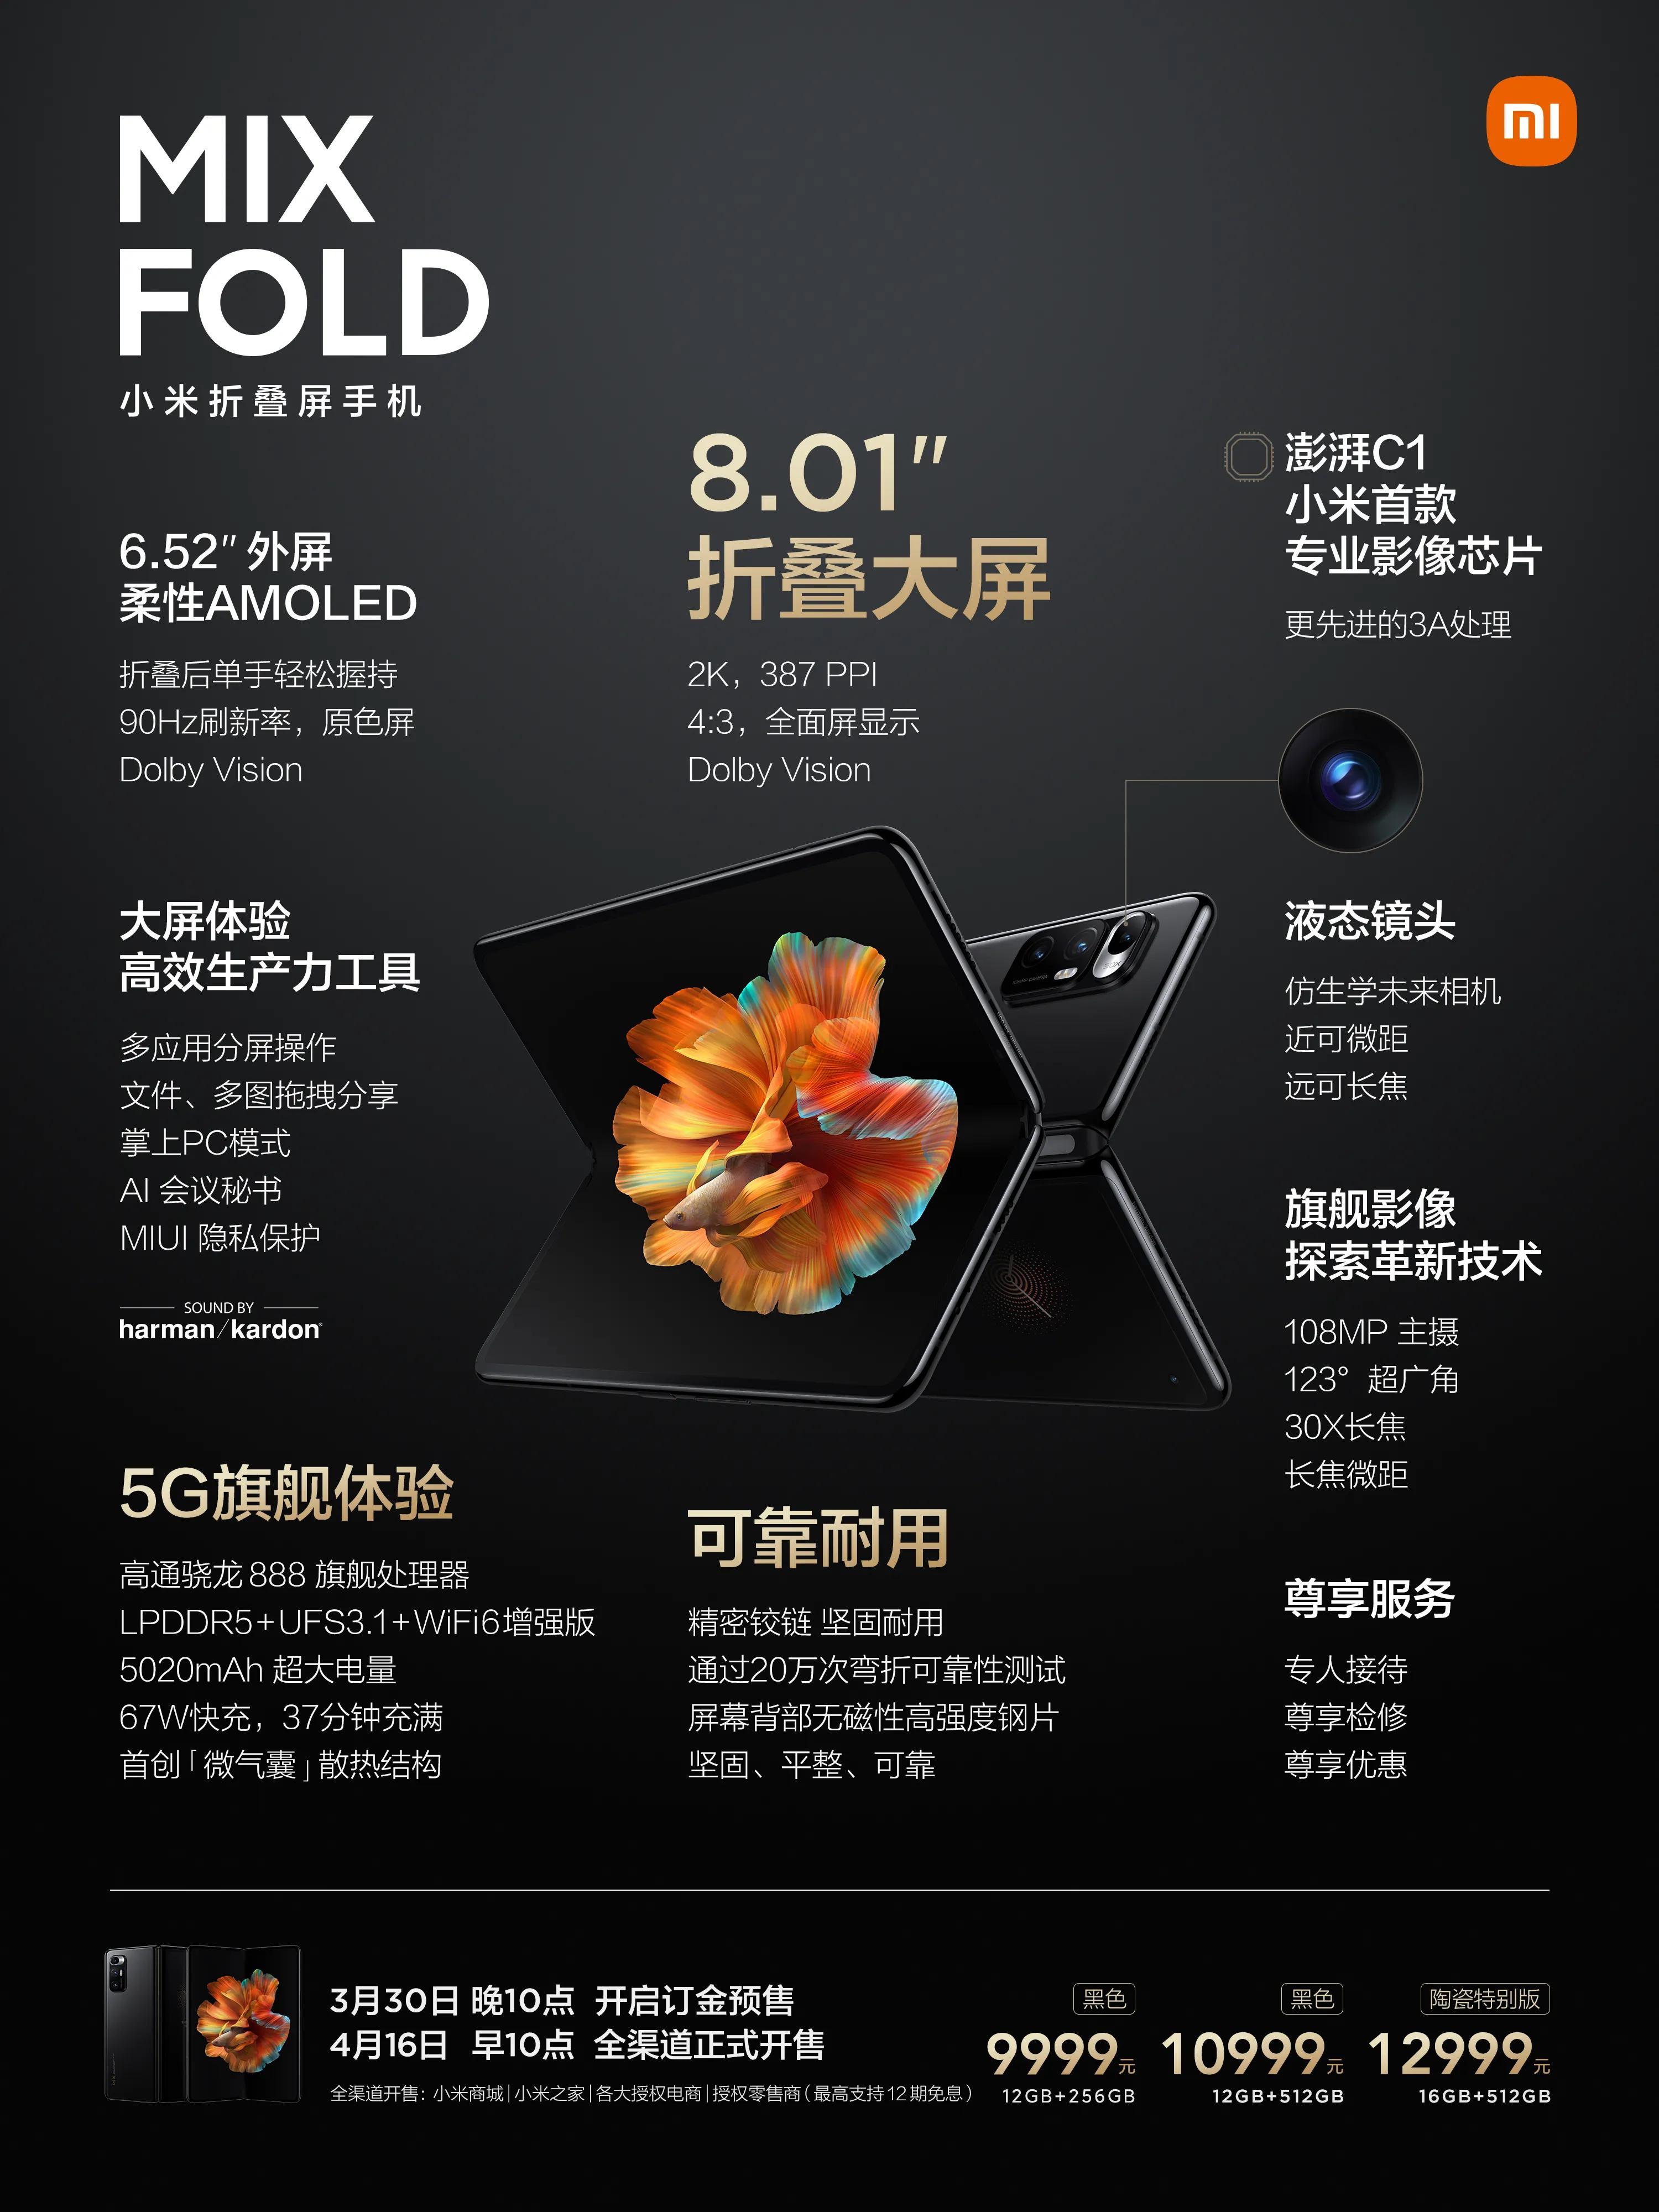 MIX FOLD小米折叠屏上手:9999元起,五大关键体验